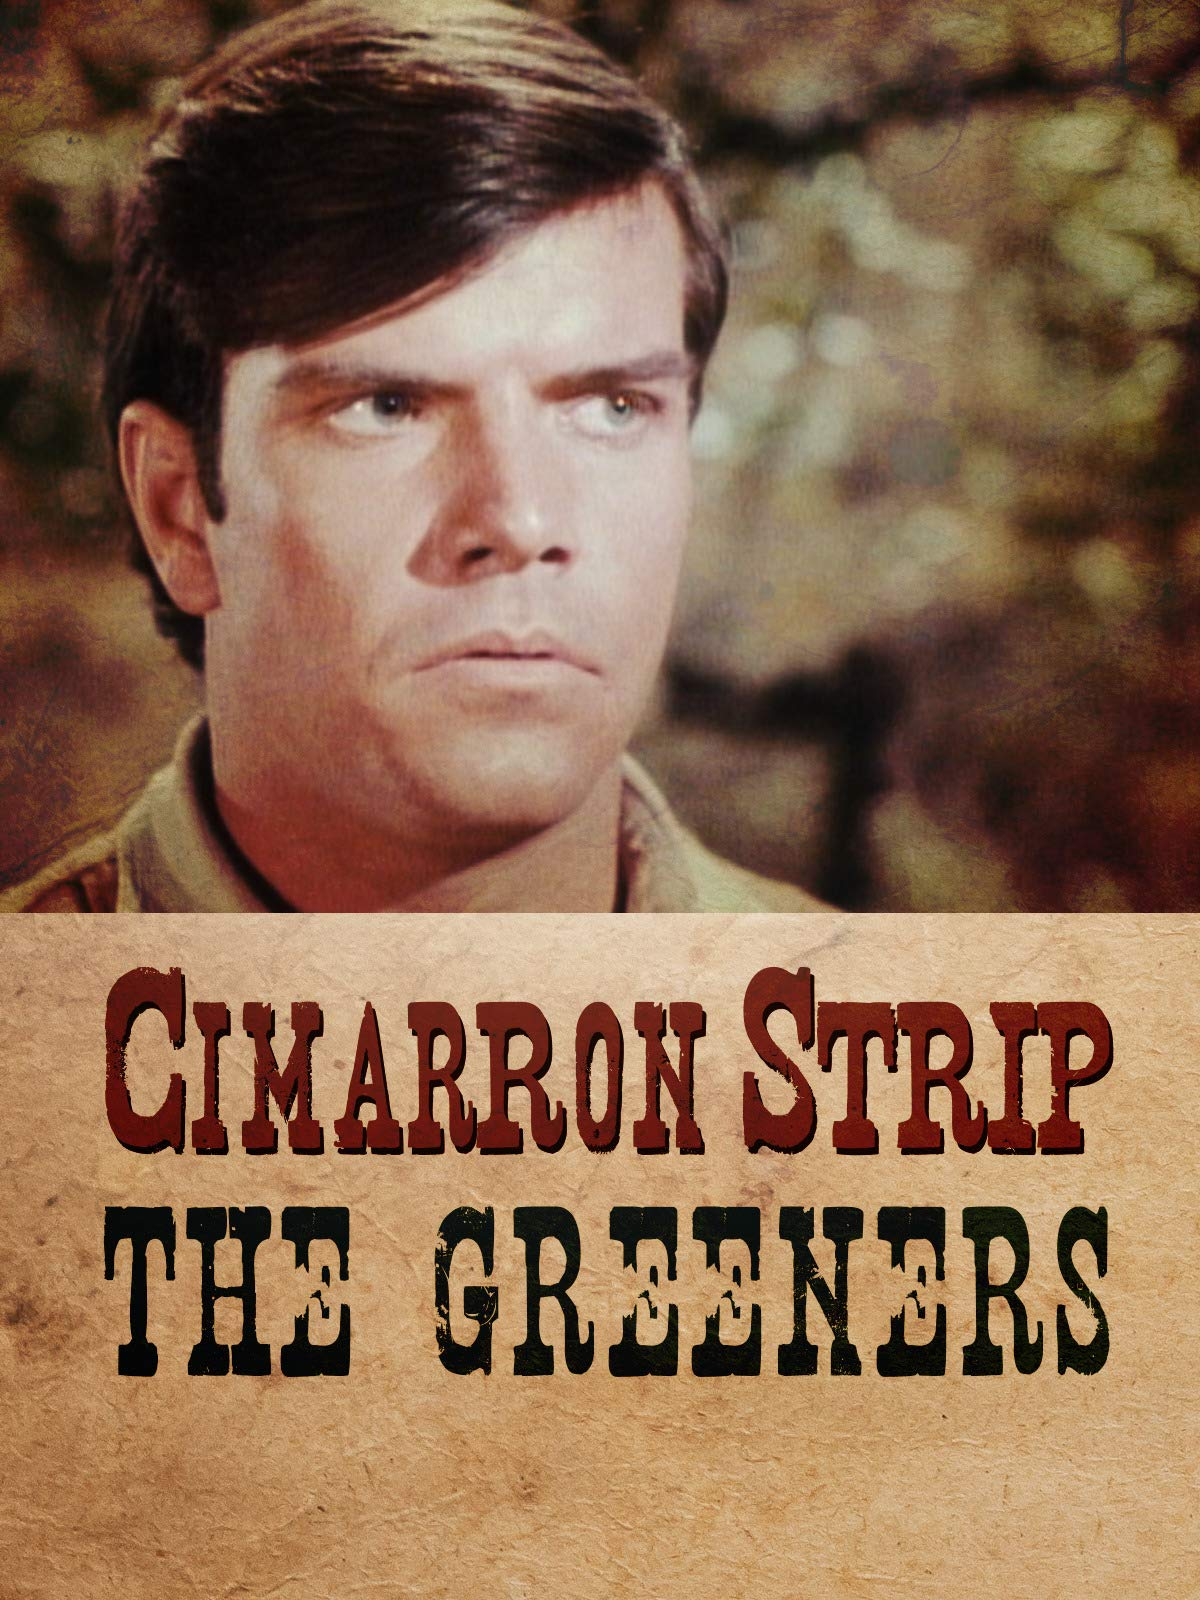 Cimarron Strip - The Greeners